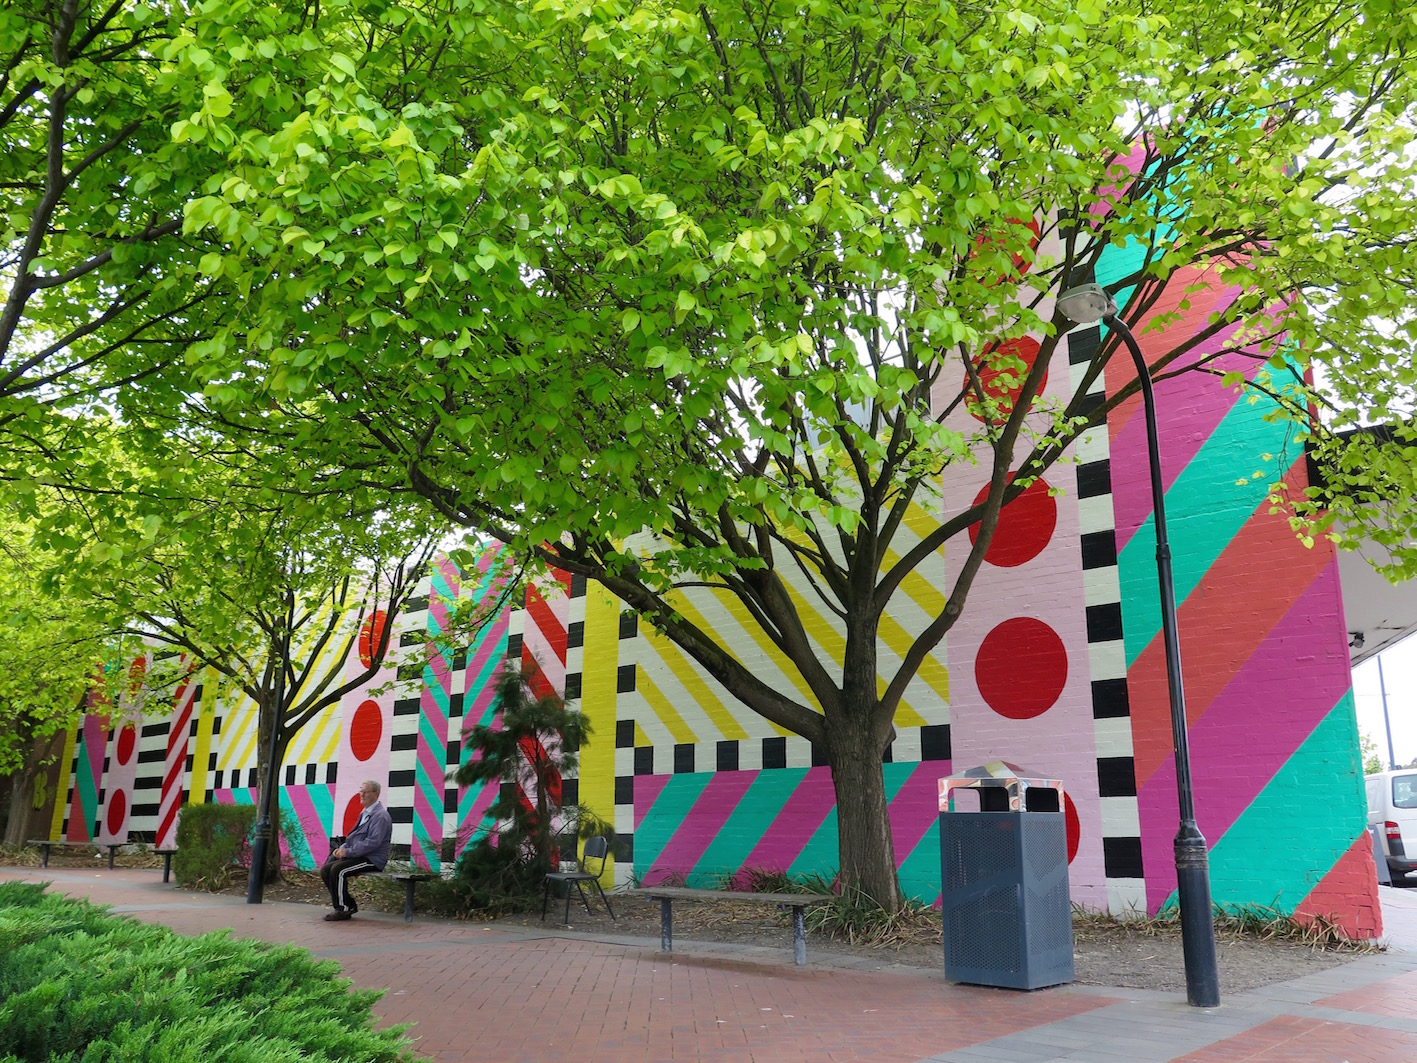 deansunshine_landofsunshine_melbourne_streetart_graffiti_eastland urban art project 5 camille walala 2